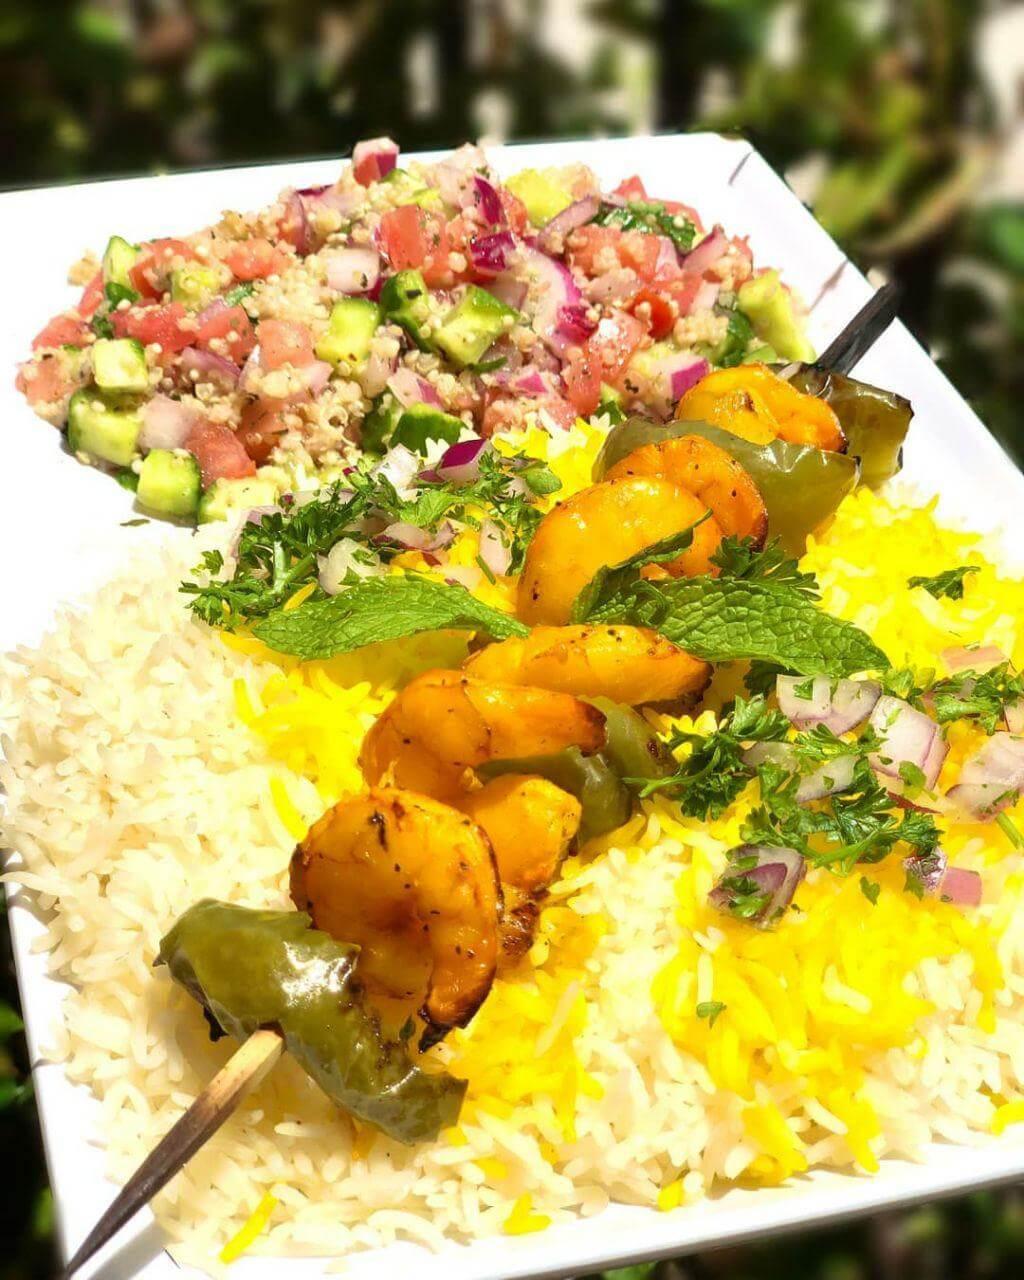 Shrimp Kabob with Quinoa salad